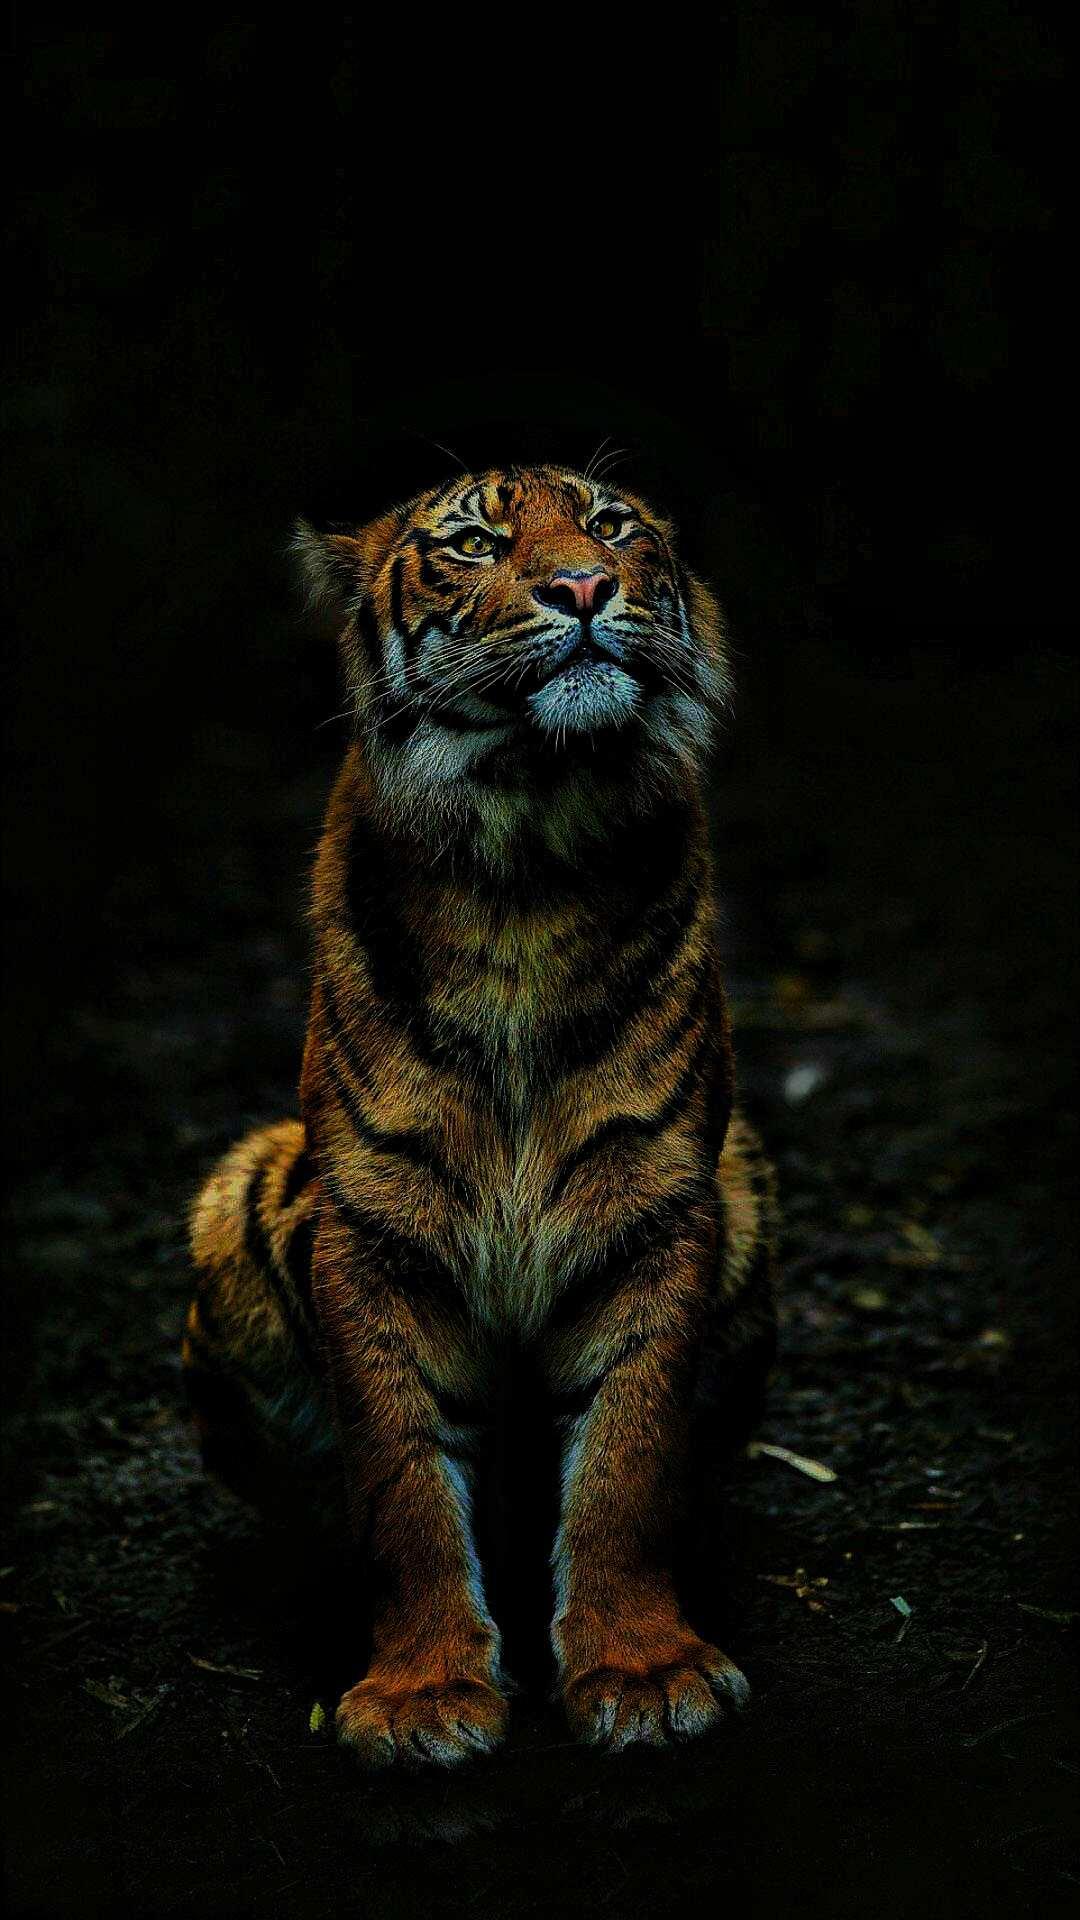 Tiger in Dark iPhone Wallpaper